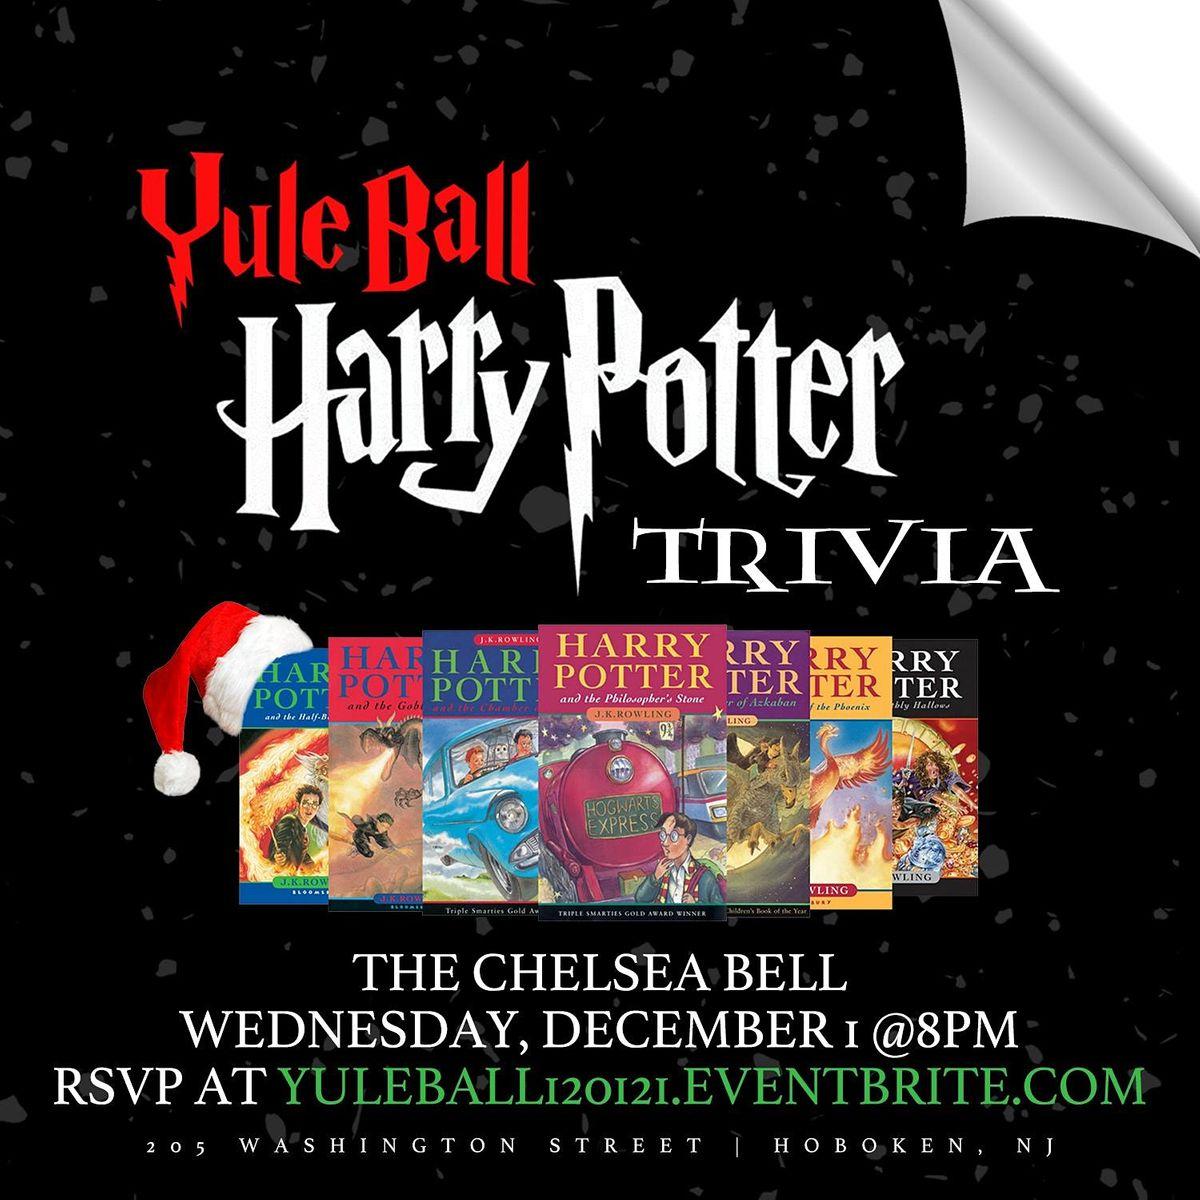 Yule Ball: Harry Potter (Book) Trivia, 1 December | Event in Hoboken | AllEvents.in